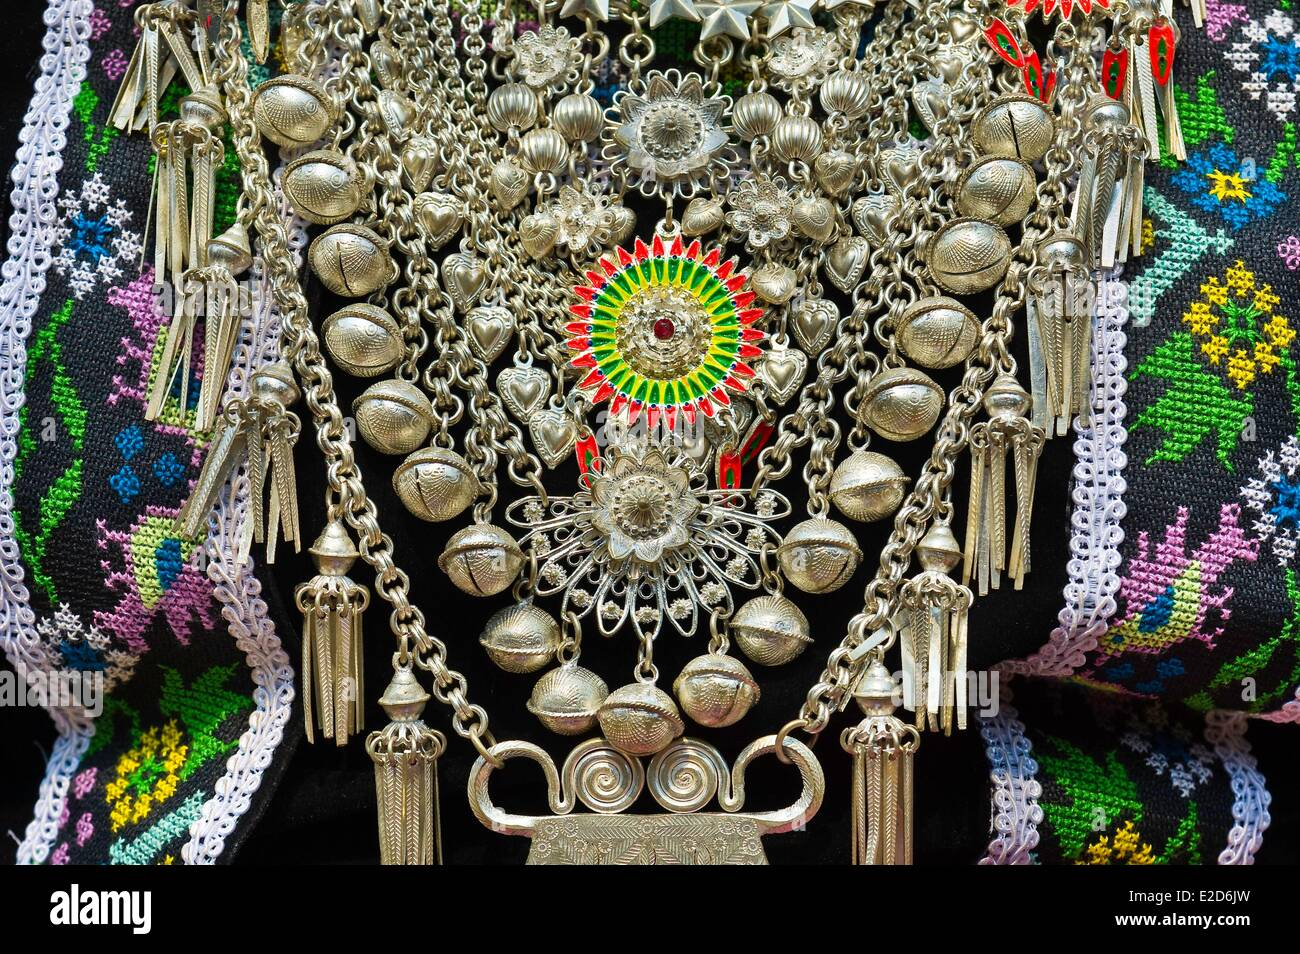 Laos Luang Prabang porvince Na Wan village Hmong detail of traditional Hmong costume silver jewelery - Stock Image